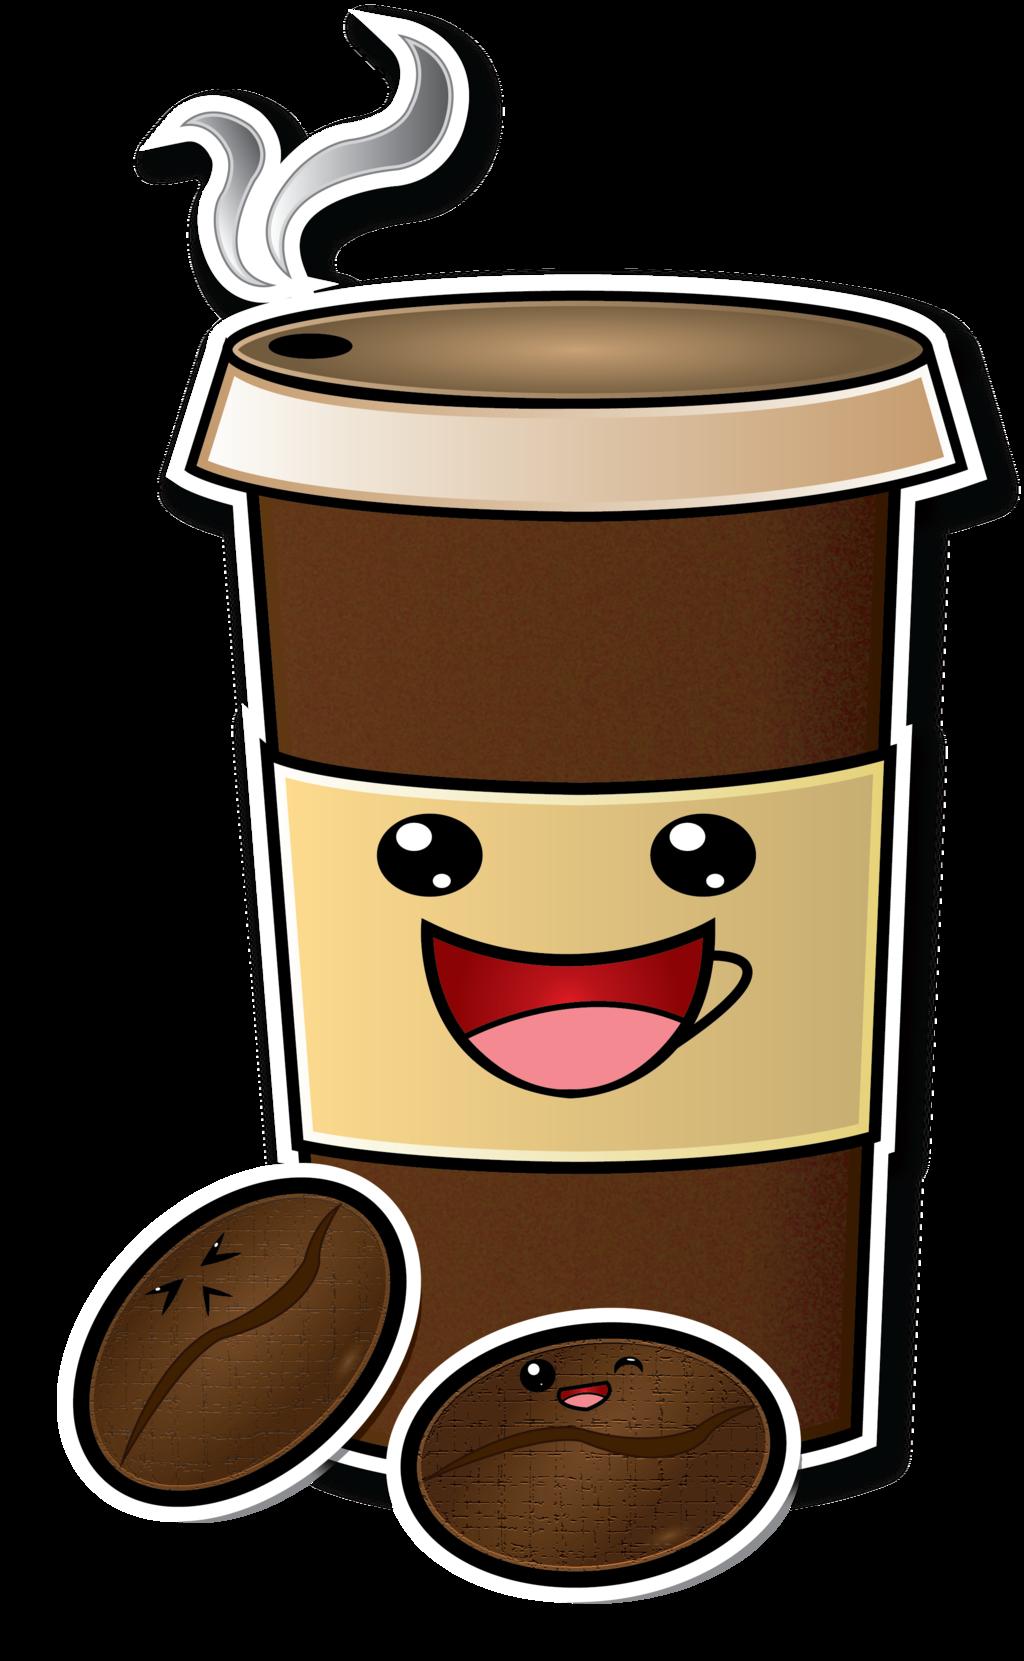 Coffee mug with heart clipart clip art free library Cute Cartoon Coffee Cup Drawing   Coffee Cartoons   Pinterest ... clip art free library